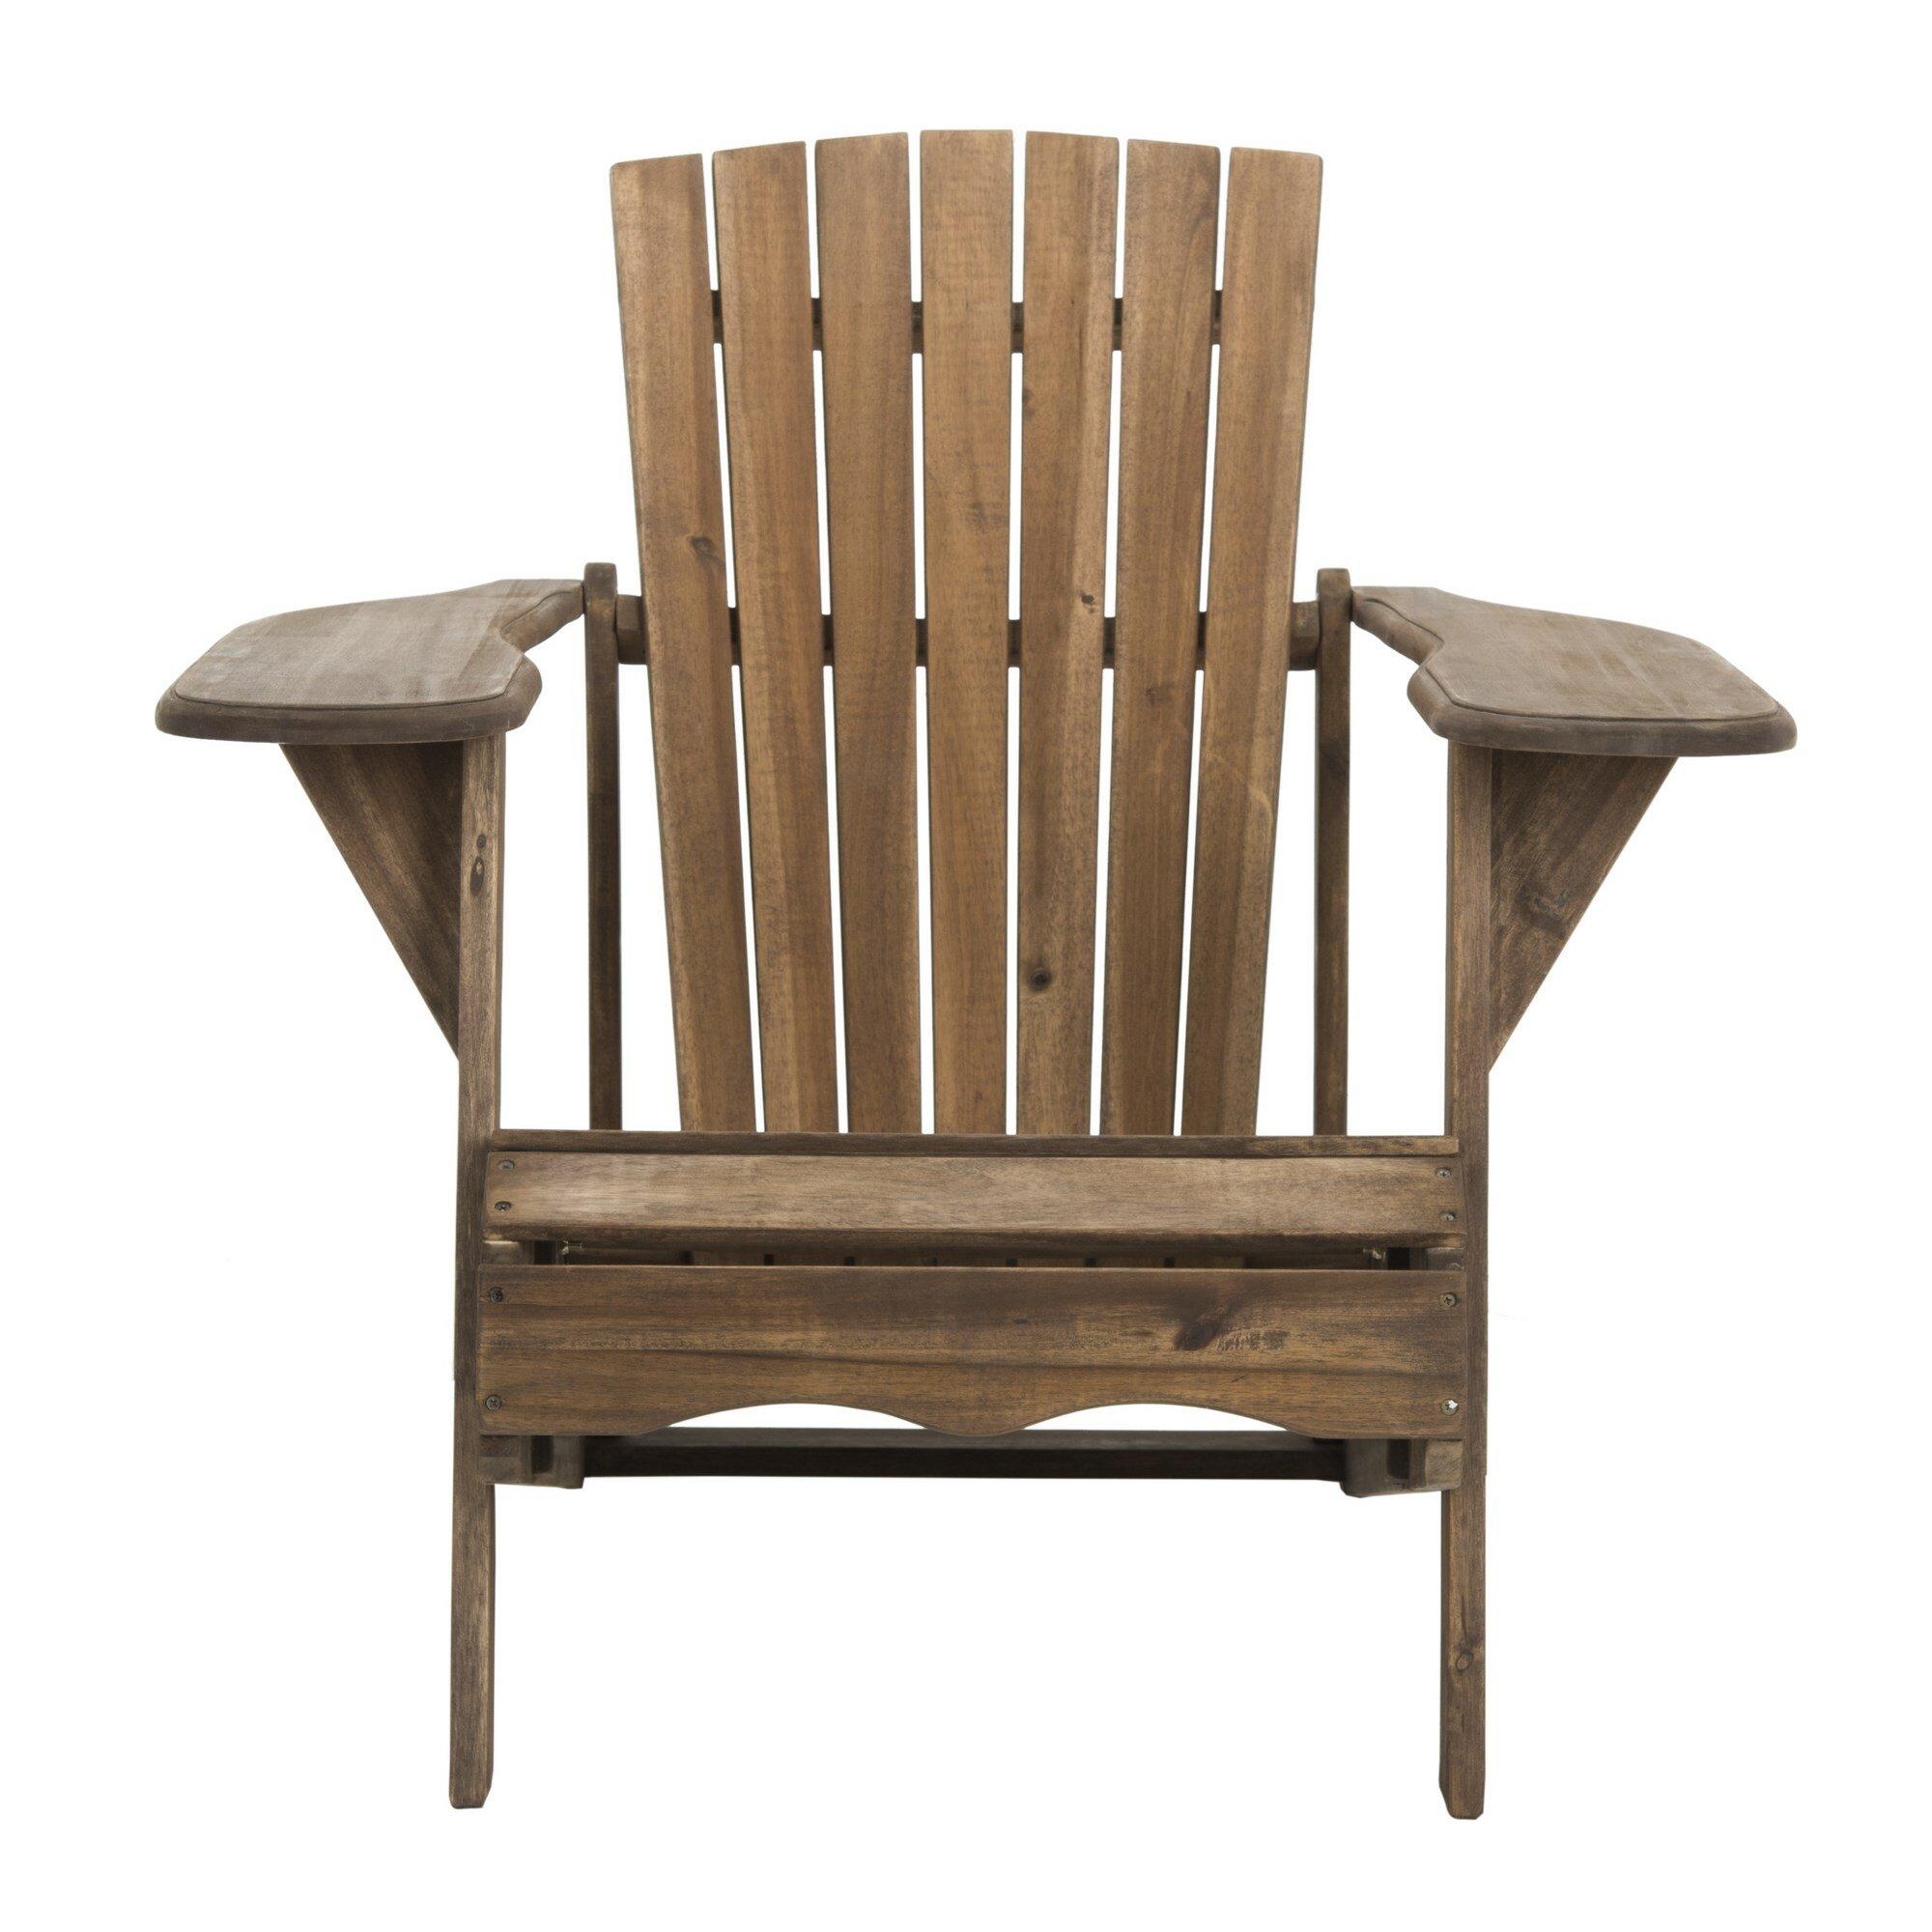 Gracie Oaks Willingboro Solid Wood Adirondack Chair U0026 Reviews | Wayfair